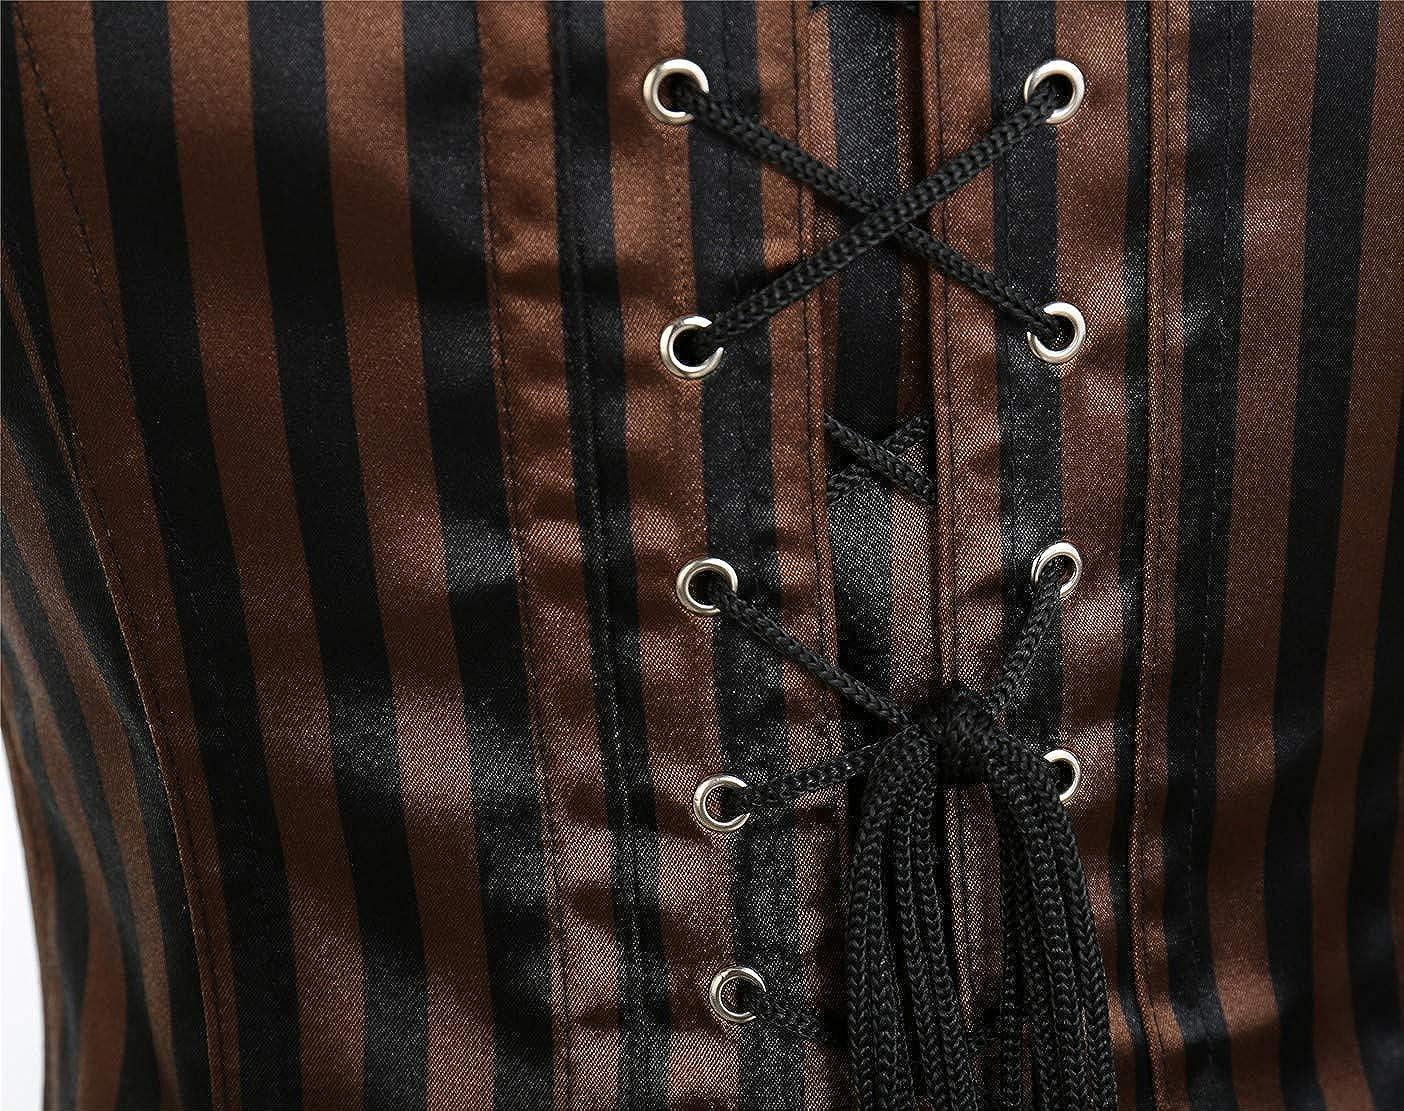 CROSS1946 Womens Gothic Steampunk Steel Boned Underbust Corset Vests Waist Training Retro Bustier